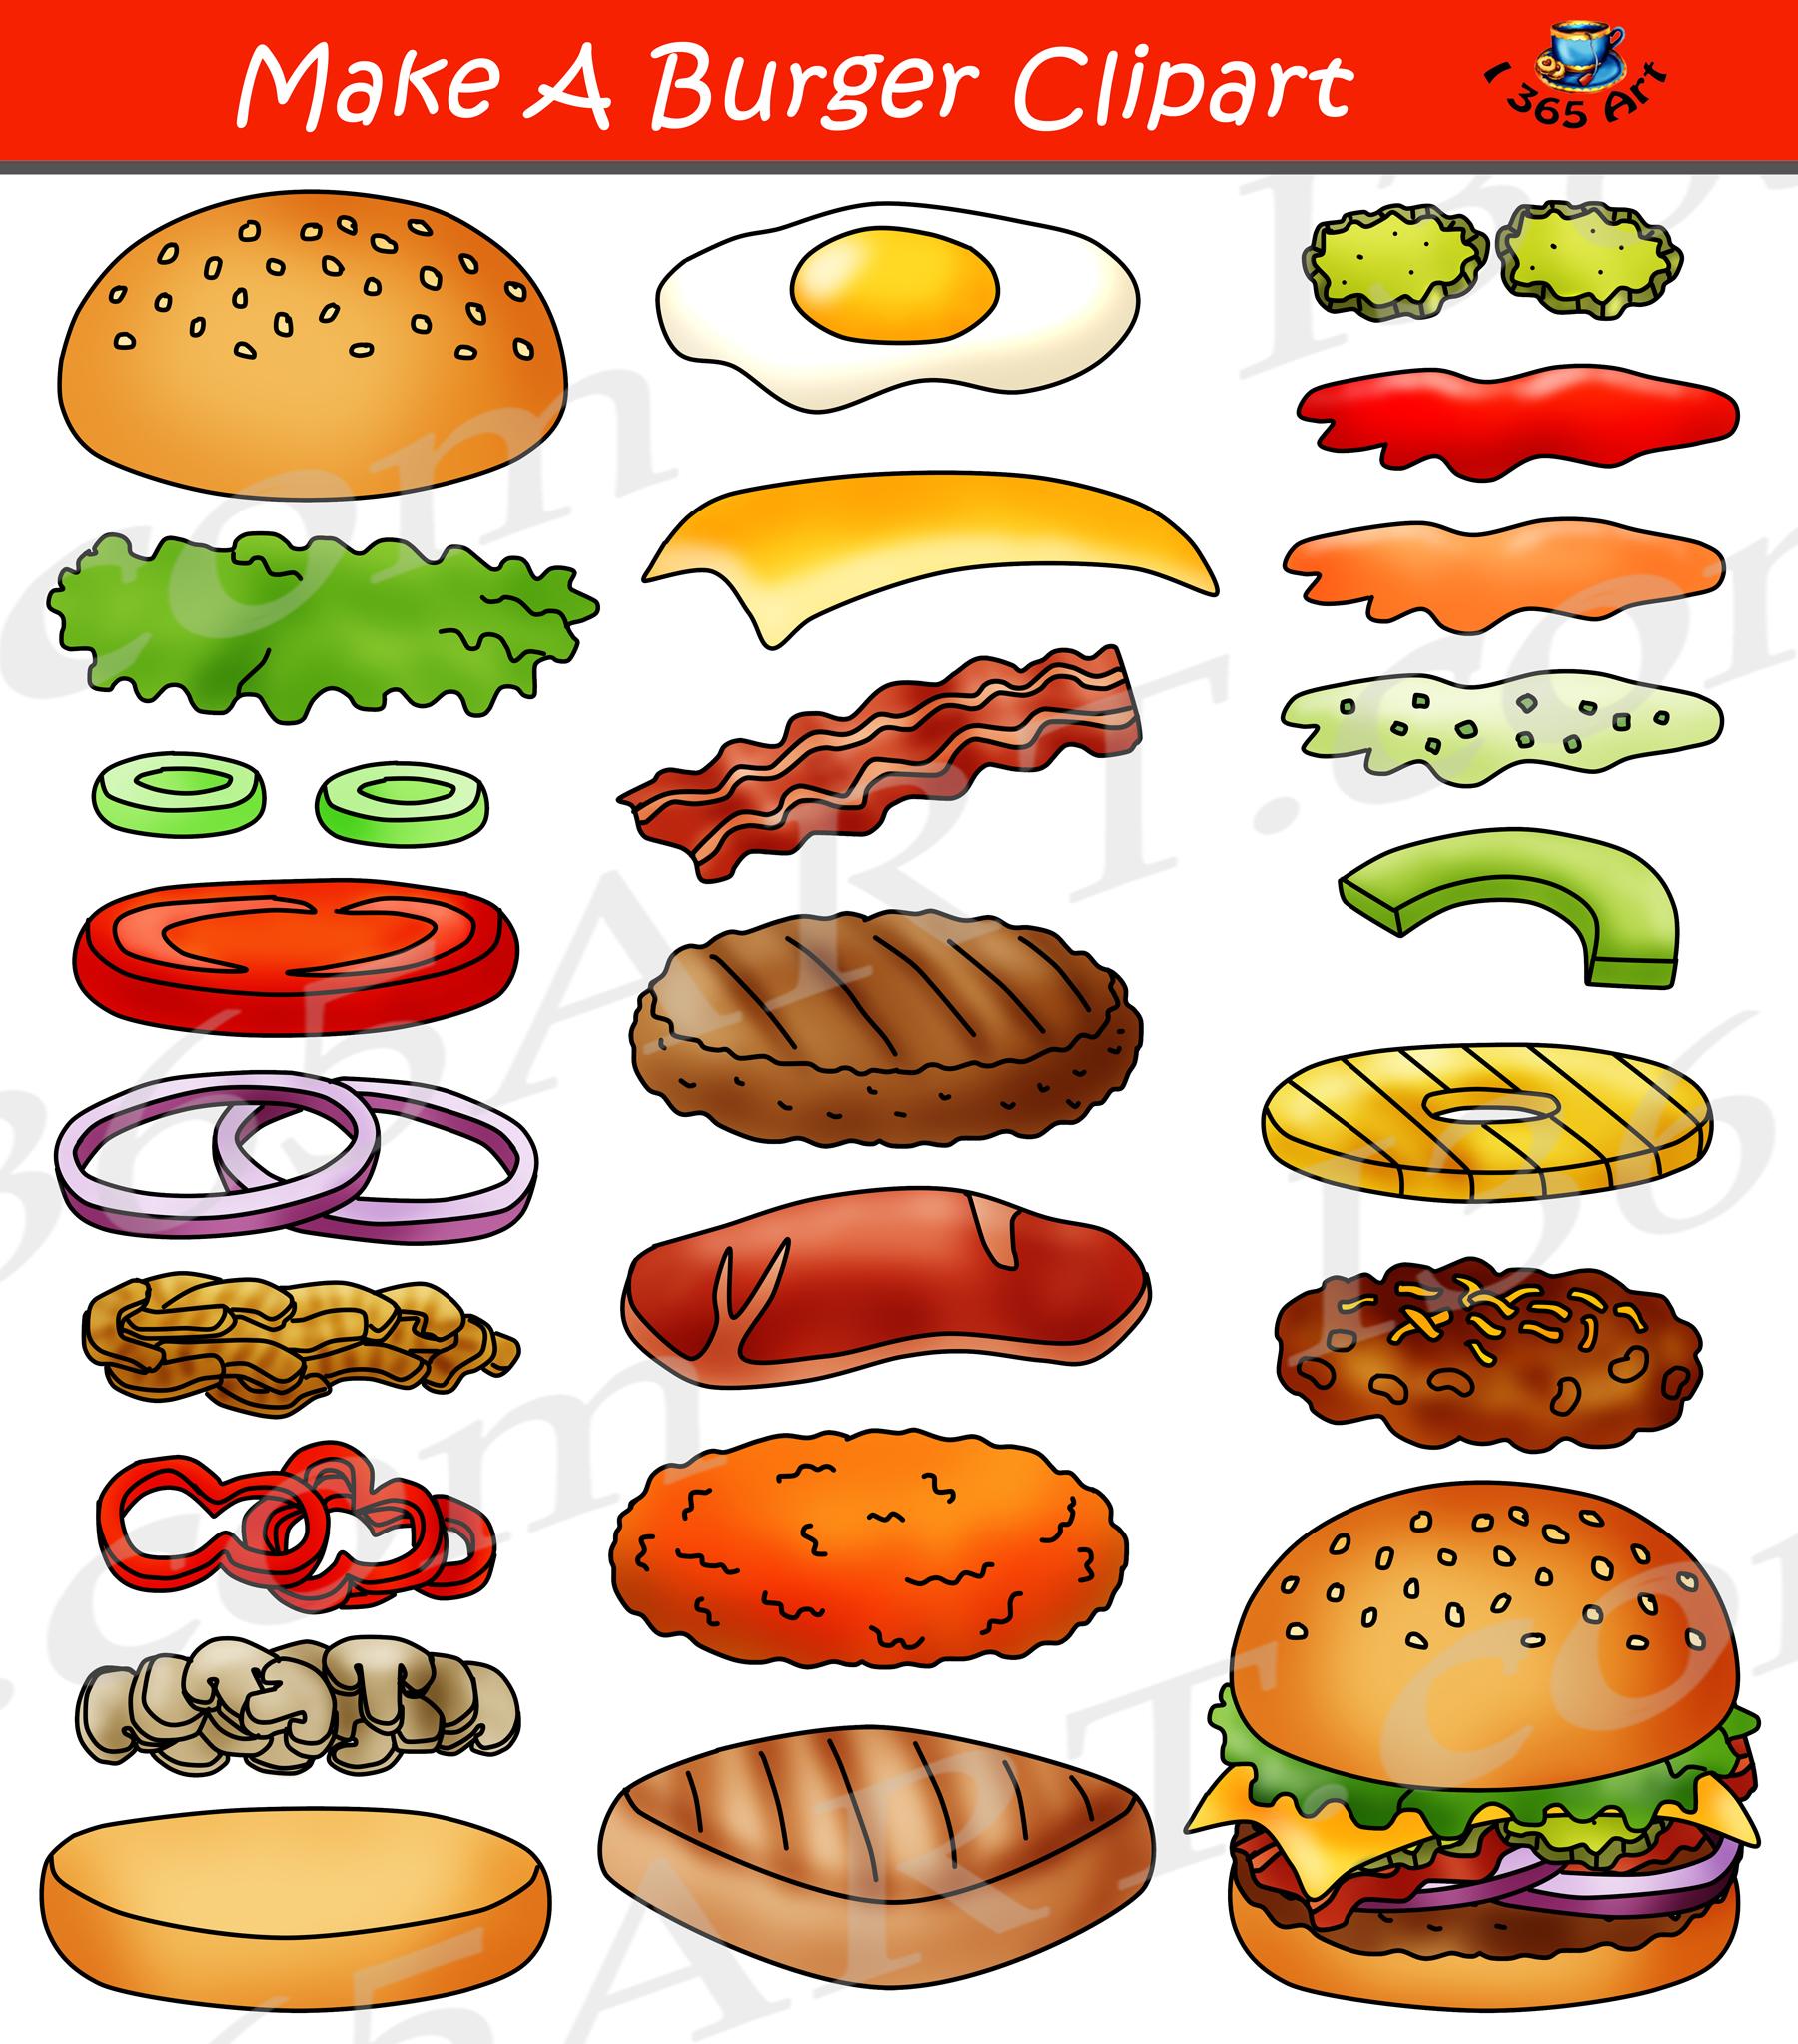 Burger clipart cheeseburger. Build a hamburger maker